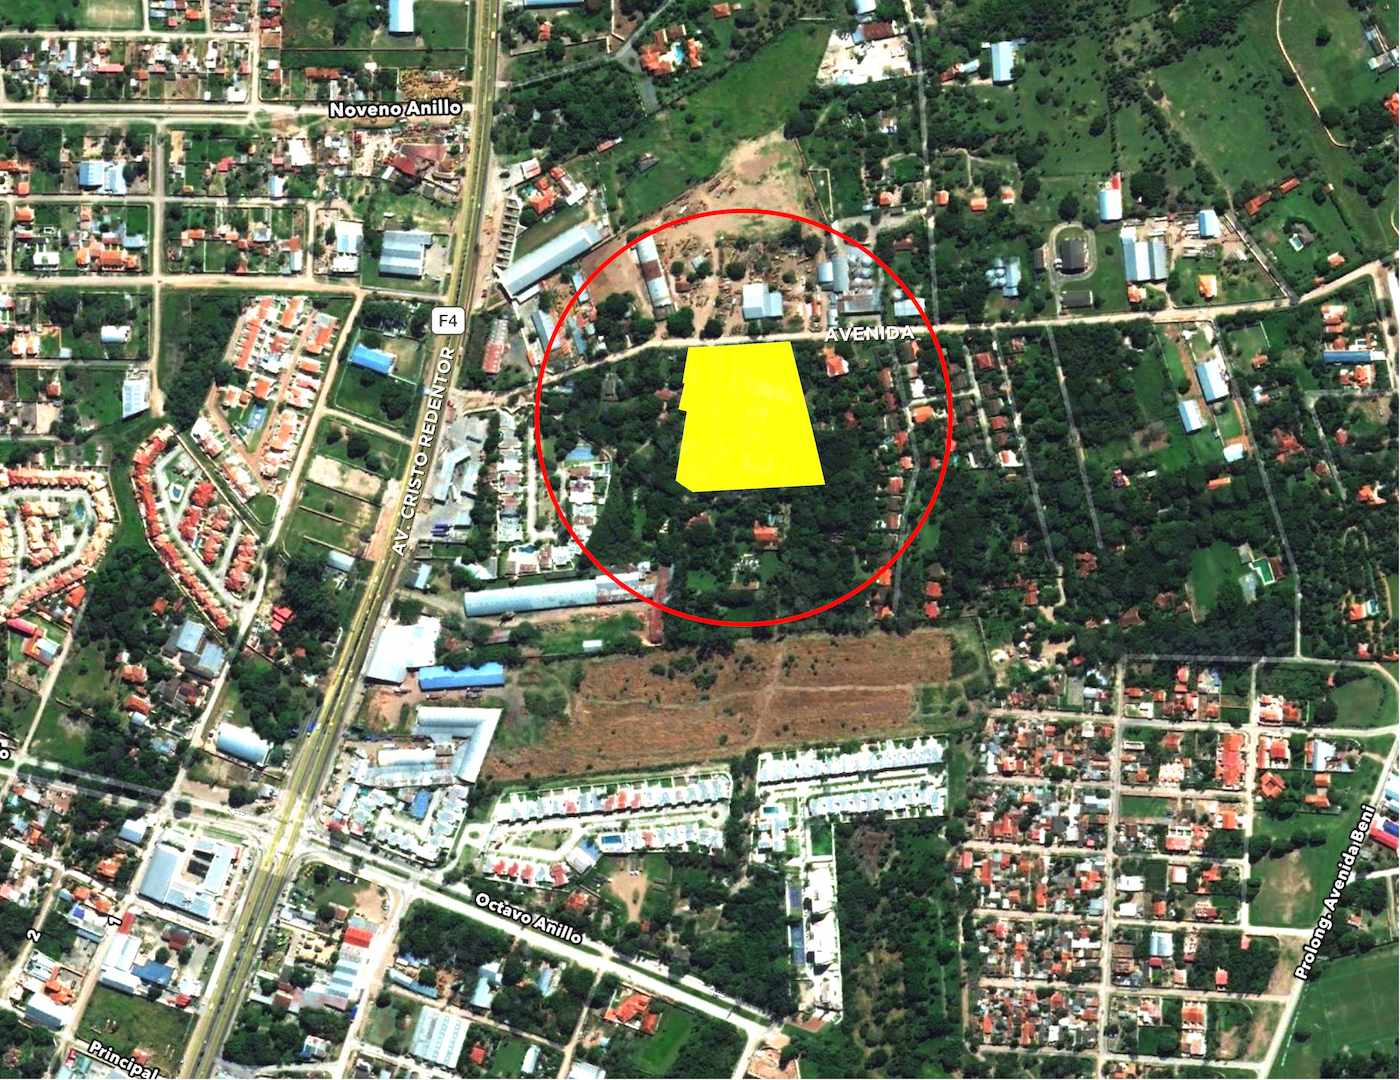 Terreno en Venta Av. Banzer Km. 7-1/2 (entre 8° & 9° anillo)... a 250 mts de la carretera Foto 5